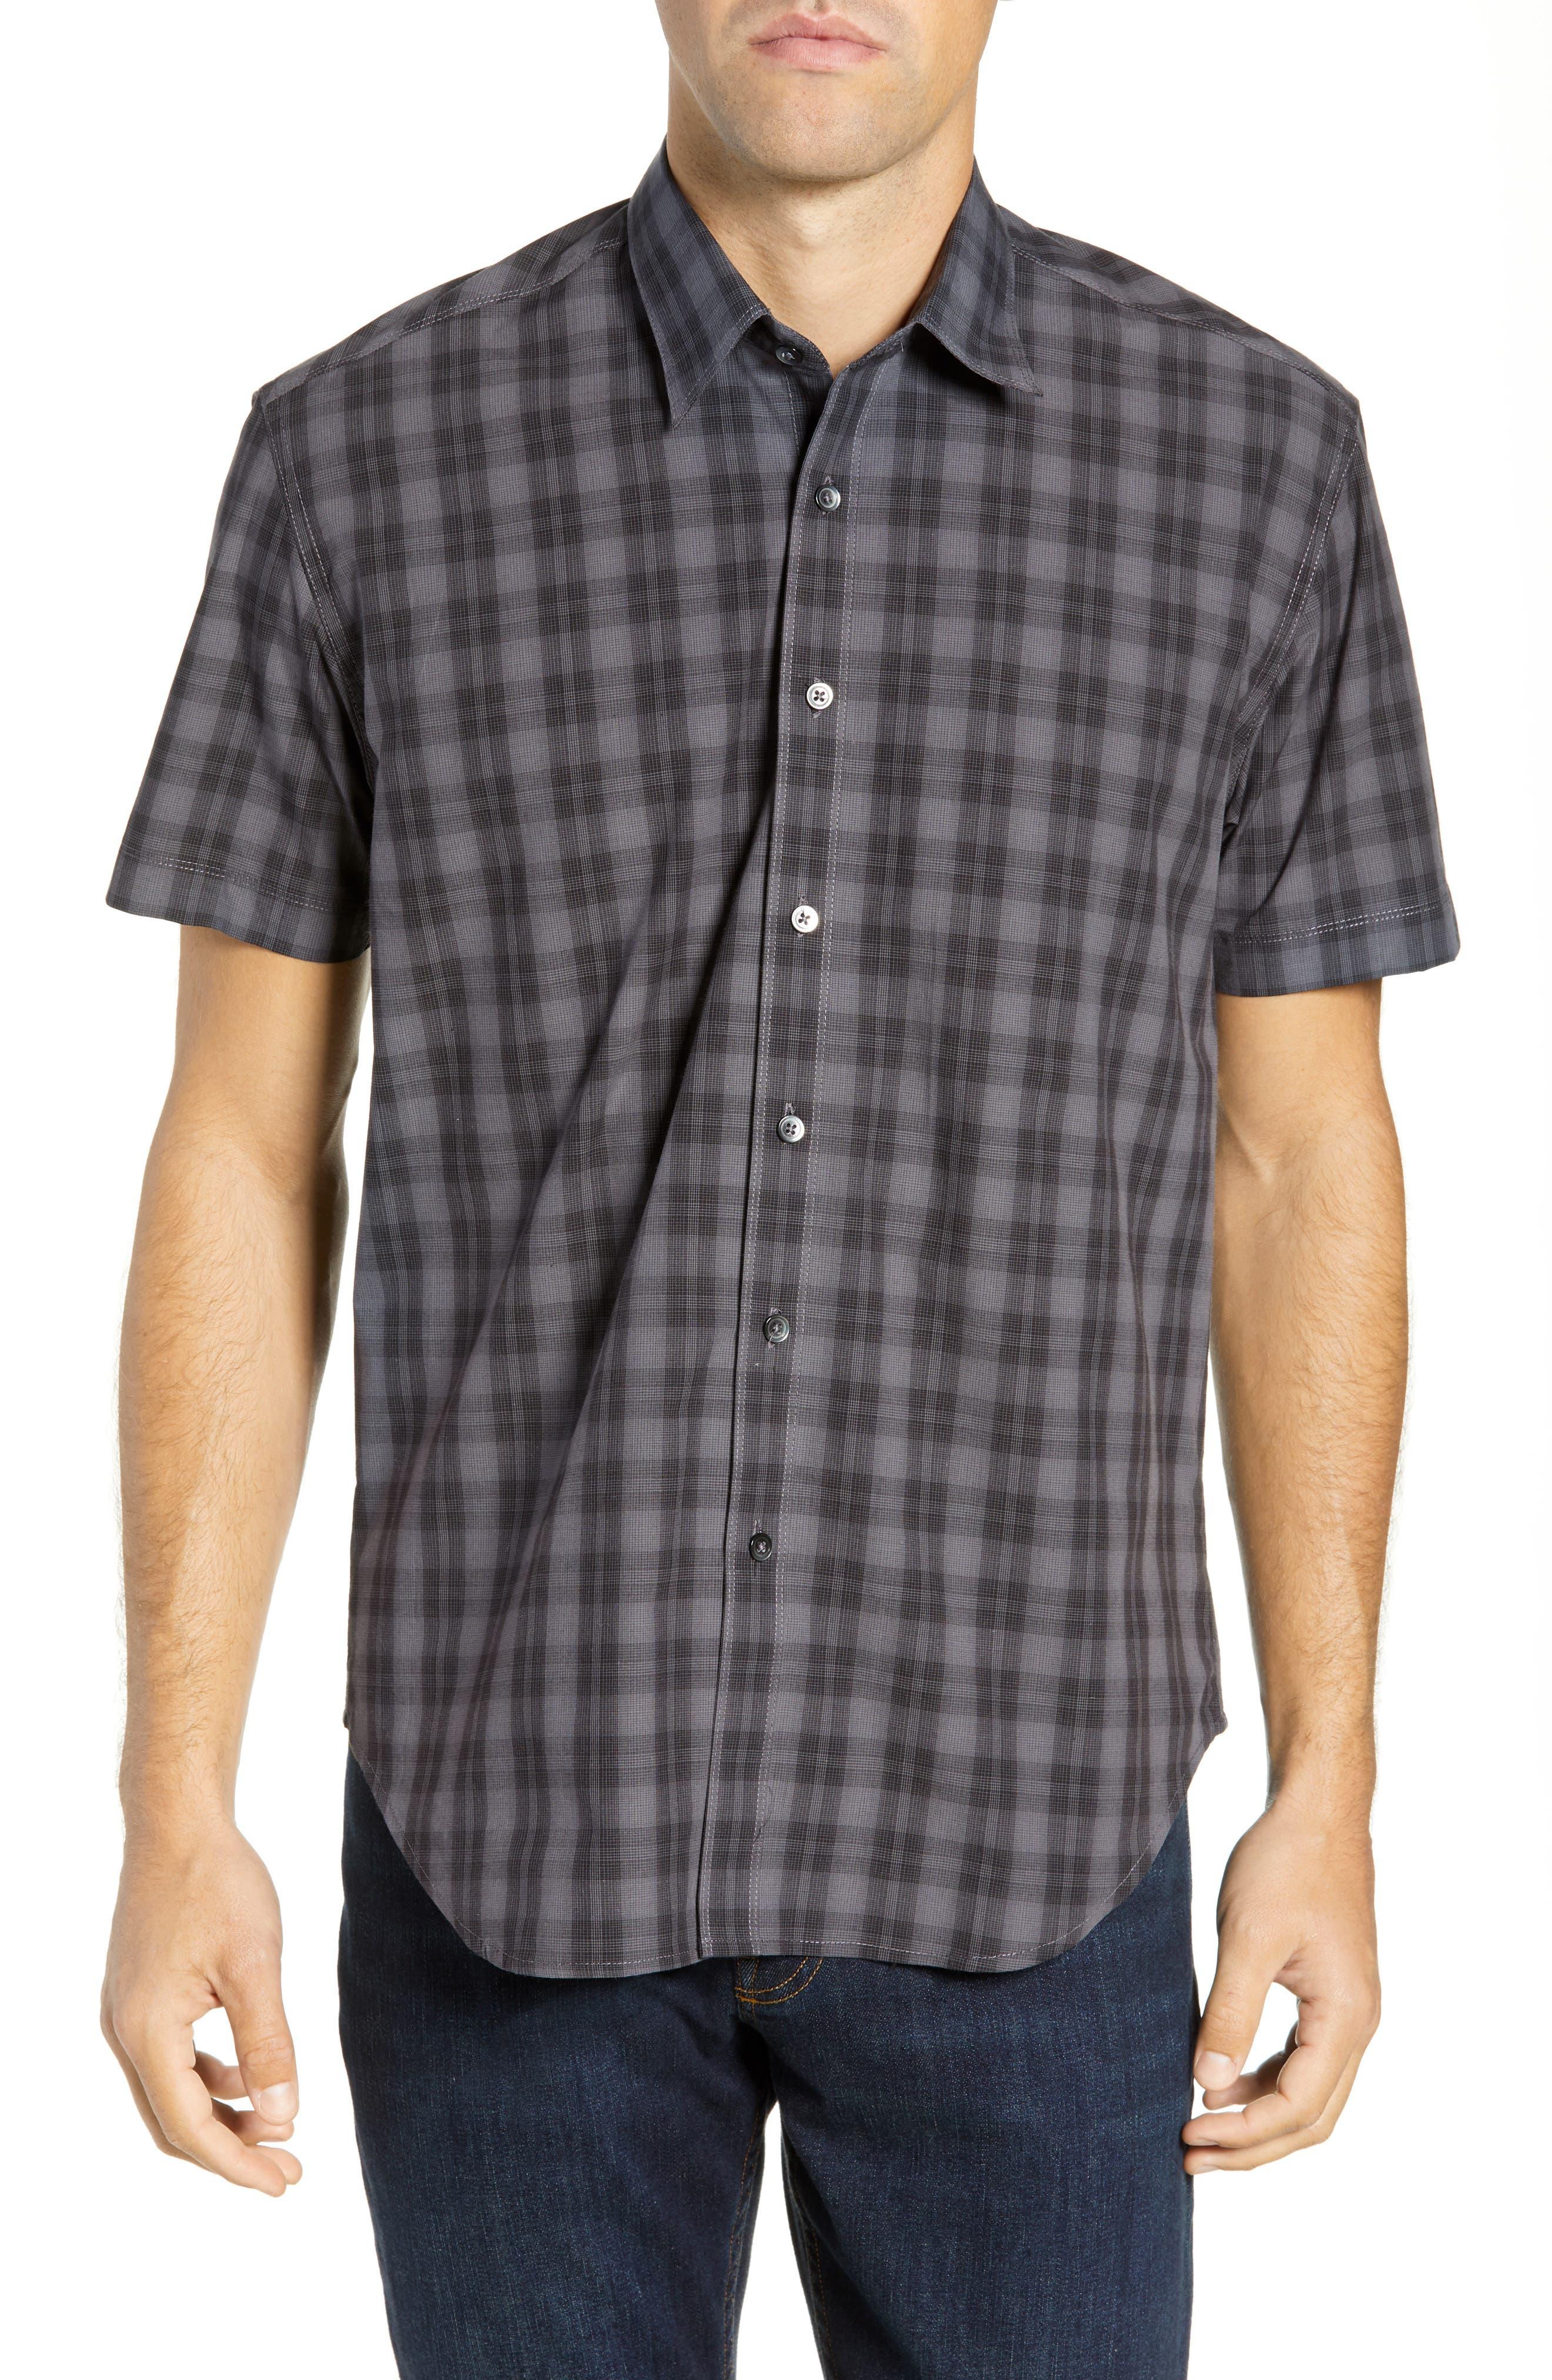 Coastaoro Blaya Regular Fit Short Sleeve Sport Shirt, Black